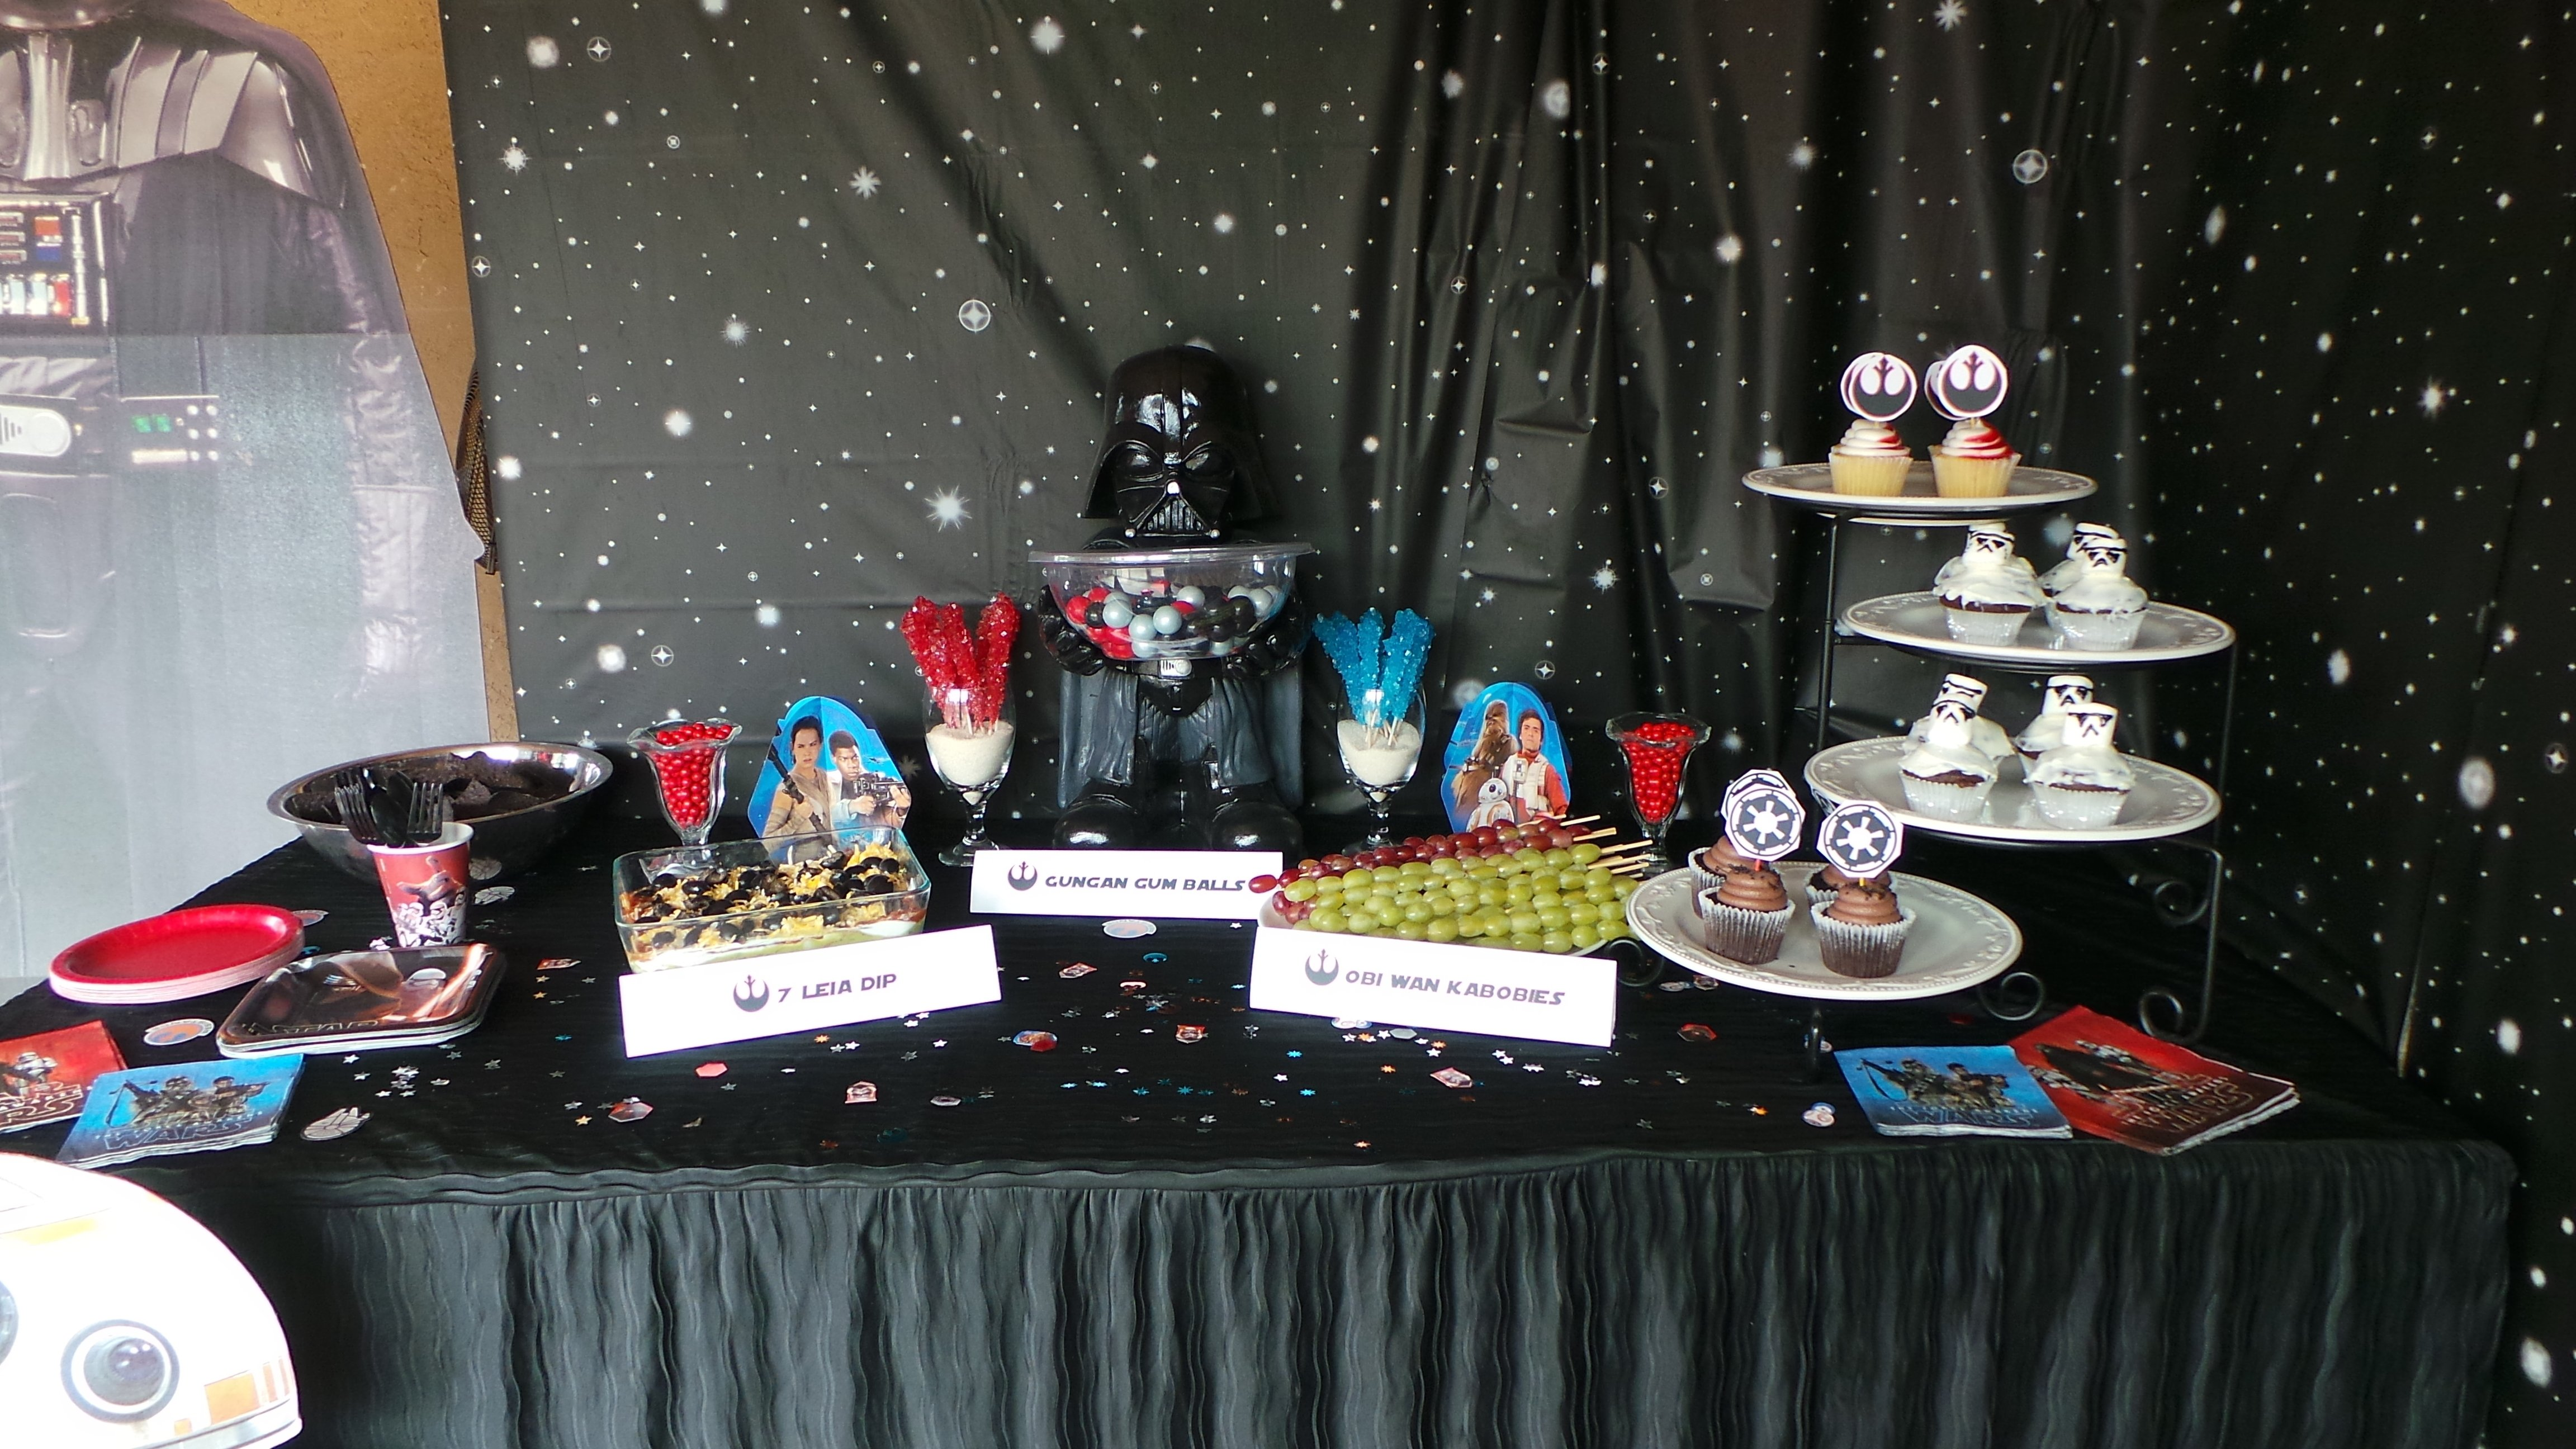 10 Lovely Star Wars Birthday Party Ideas star wars partykate hamernik birthday express 2020